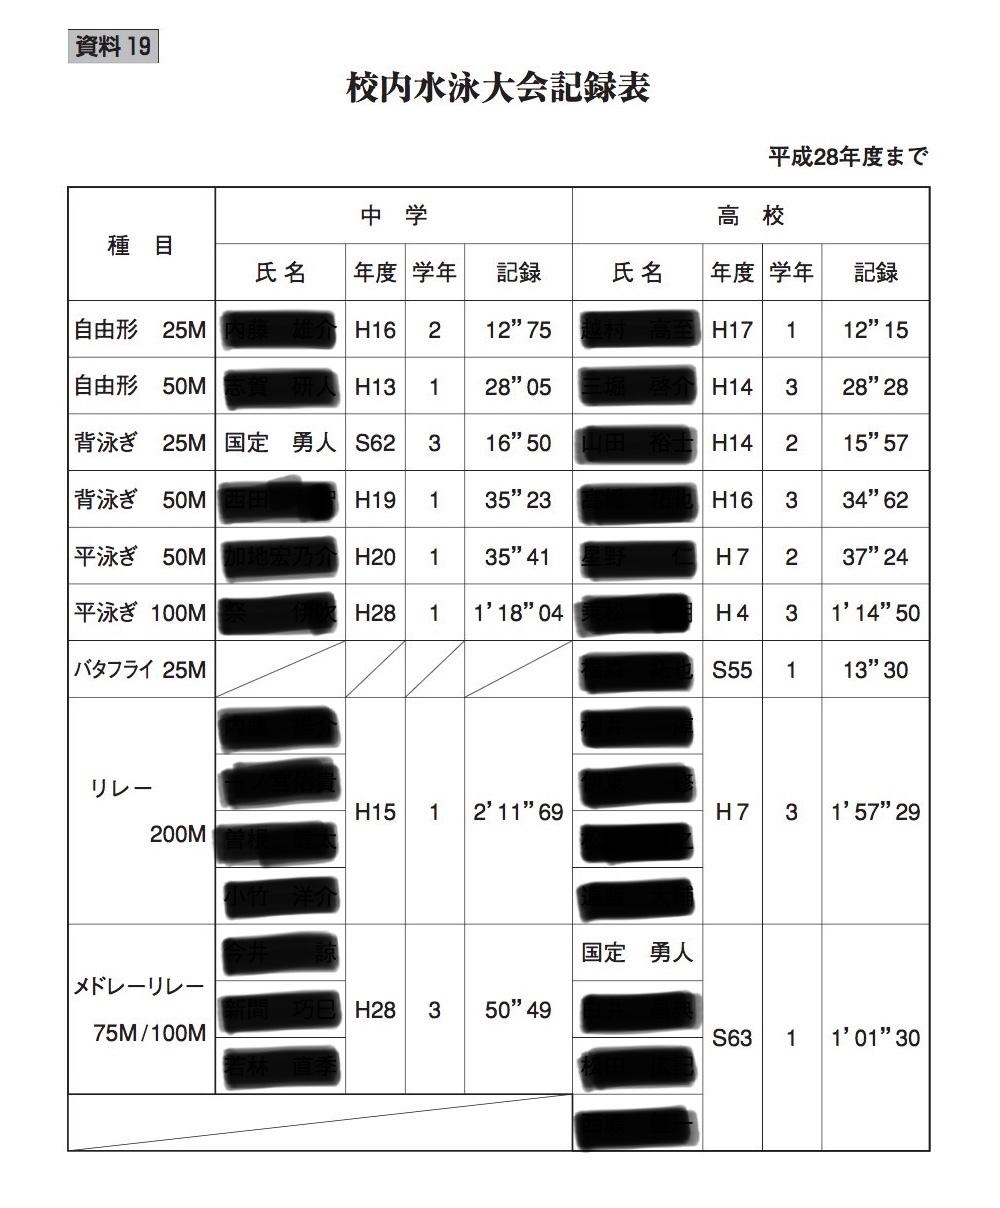 B337108F-0D3E-4EE0-86B5-D82C7AD11A72.jpeg